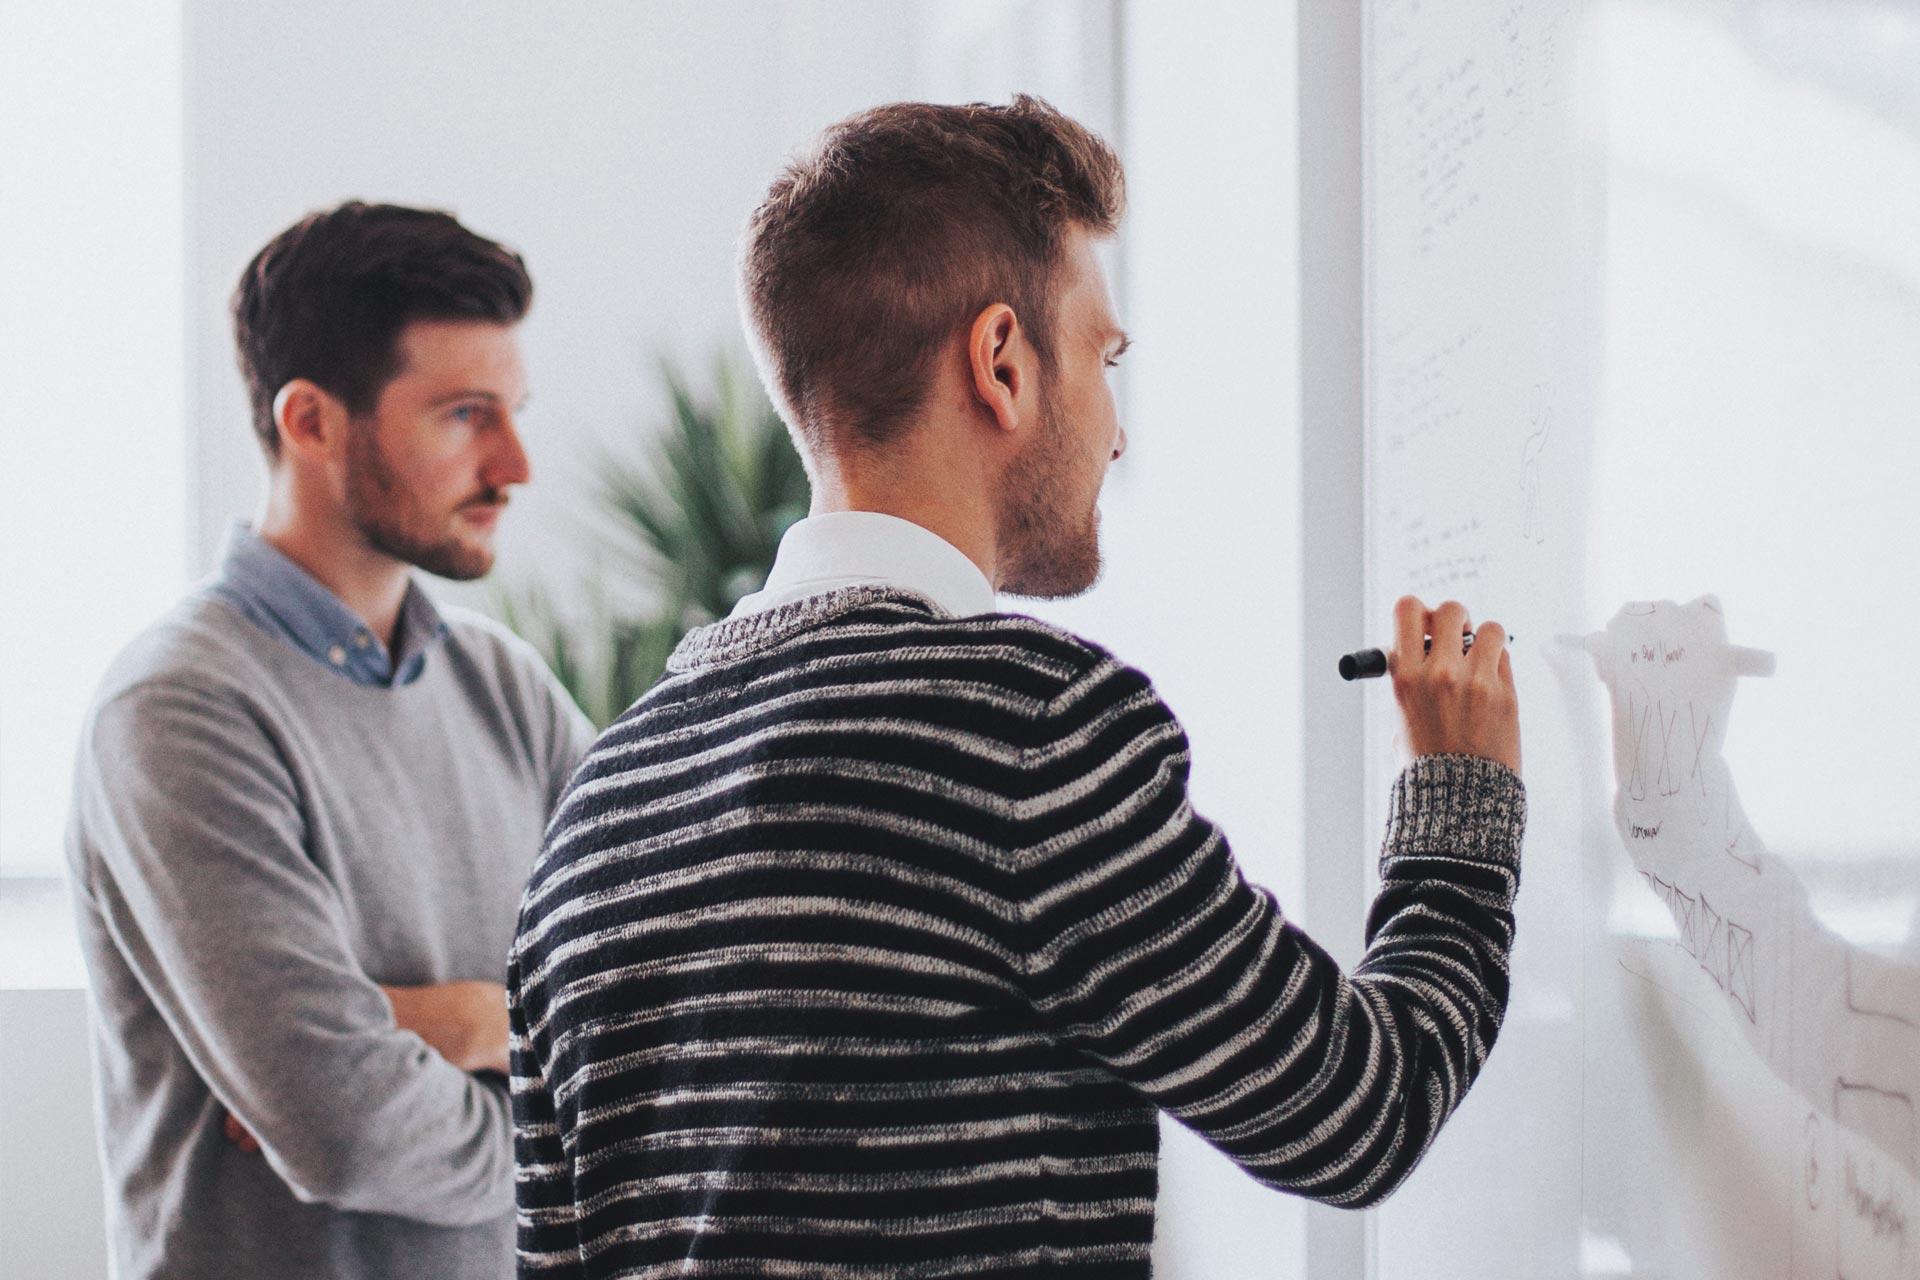 Collaborating on Web Design